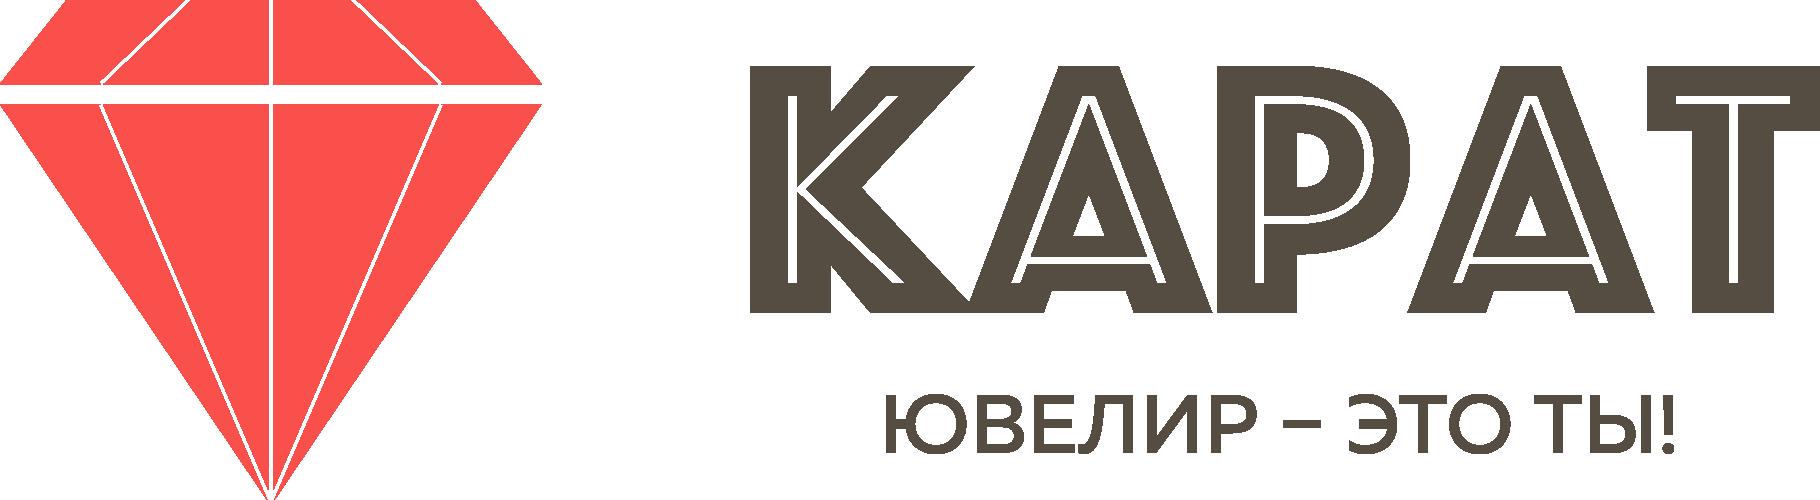 "Ювелирная школа ""Карат"""